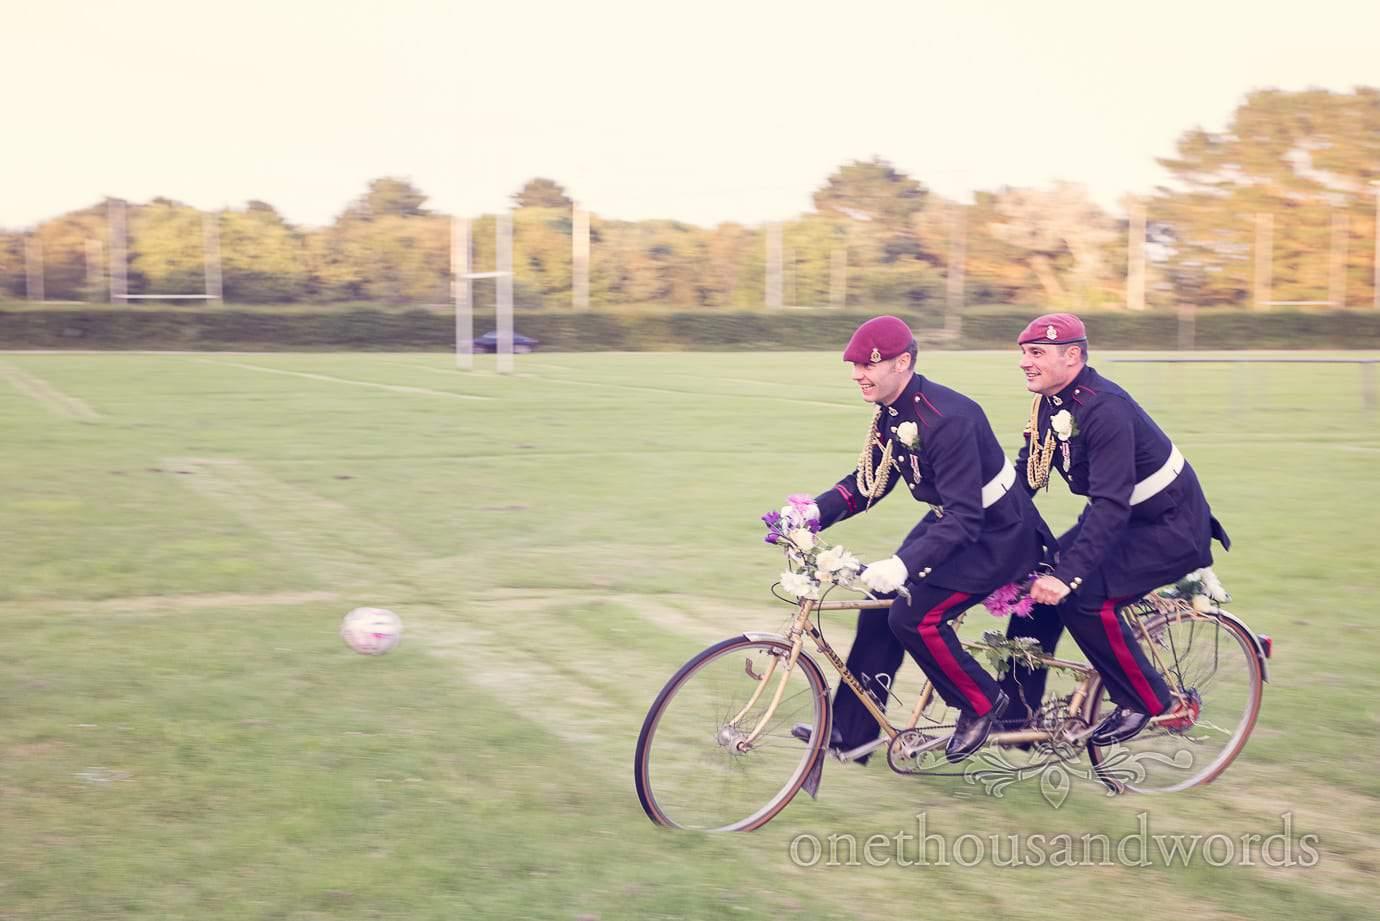 Groom and best man in military unifor ride tandem wedding bike